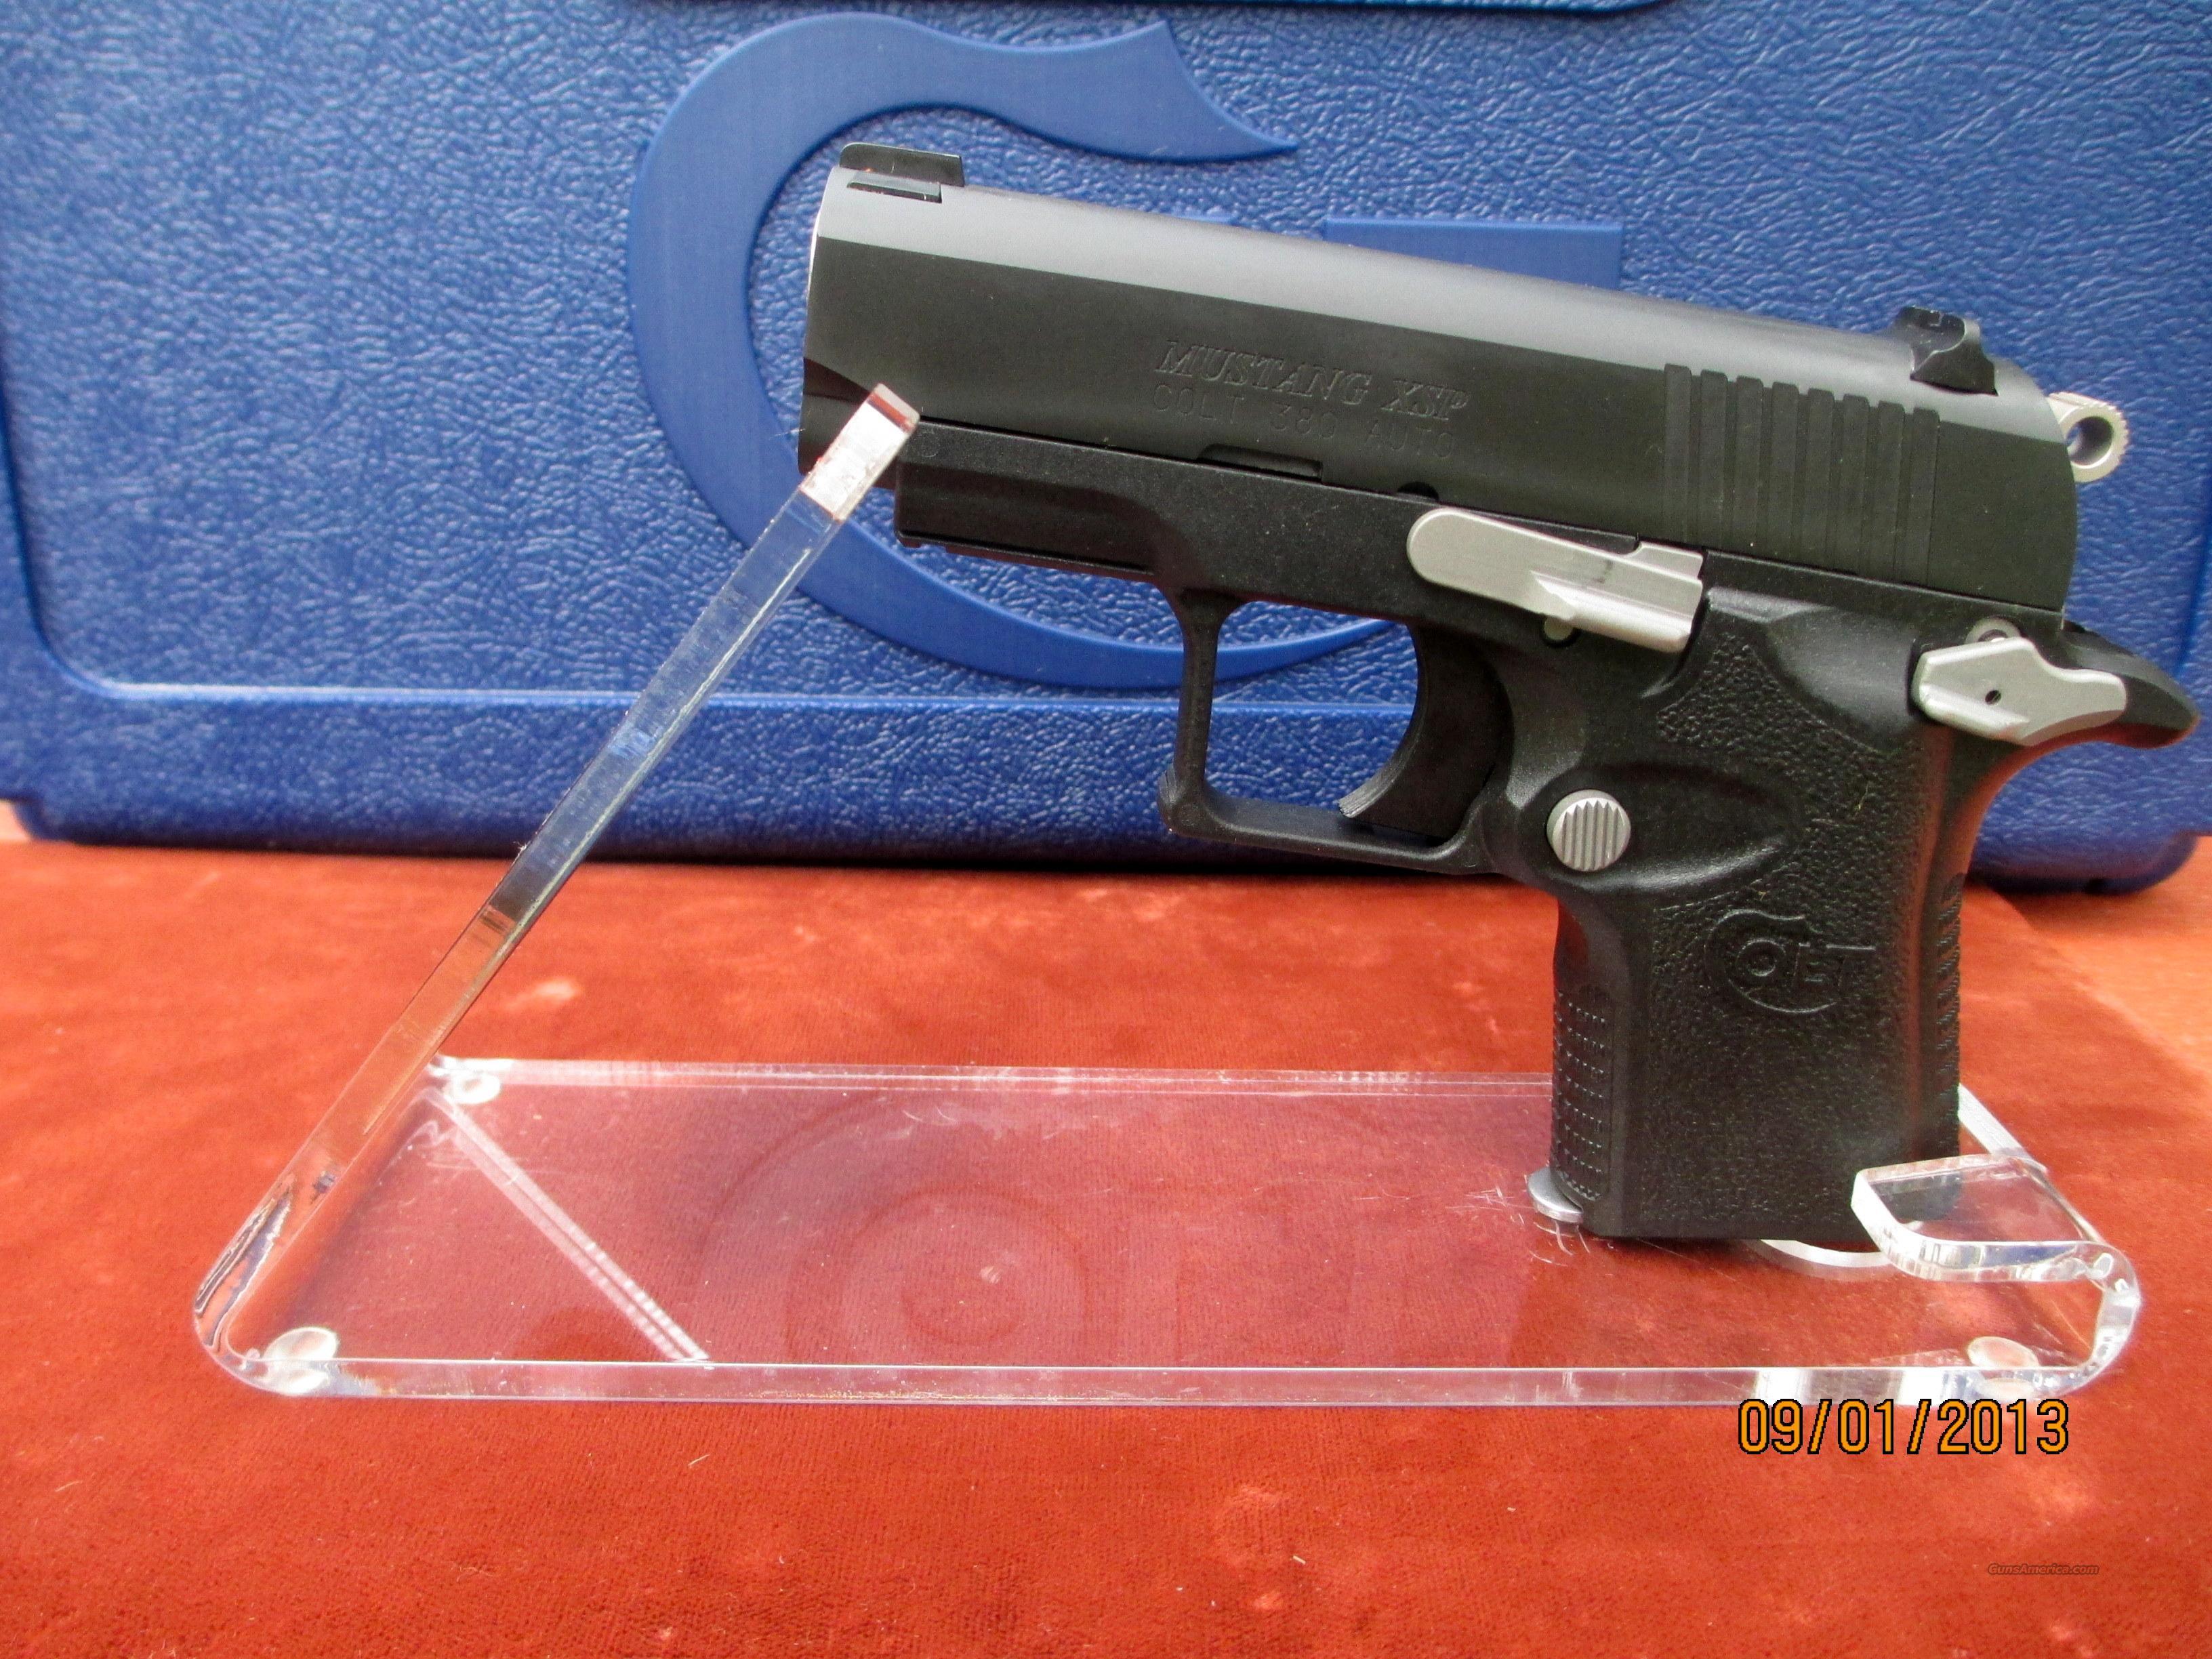 NEW COLT 380ACP POLYMER MUSTANG DISCONTINUED MODEL  Guns > Pistols > Colt Automatic Pistols (.25, .32, & .380 cal)